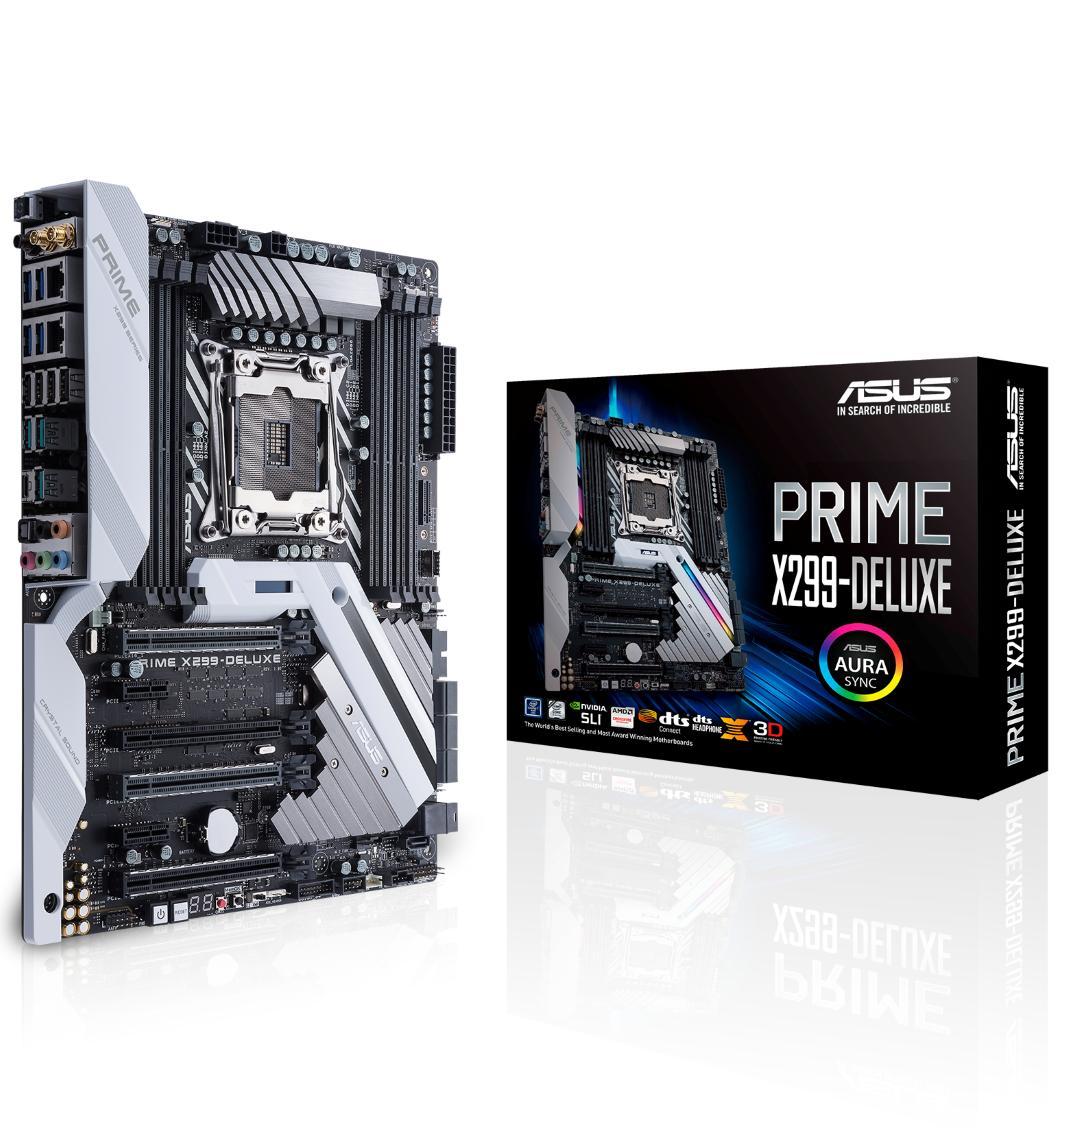 Asus PRIME X299-DELUXE ATX LGA 2066